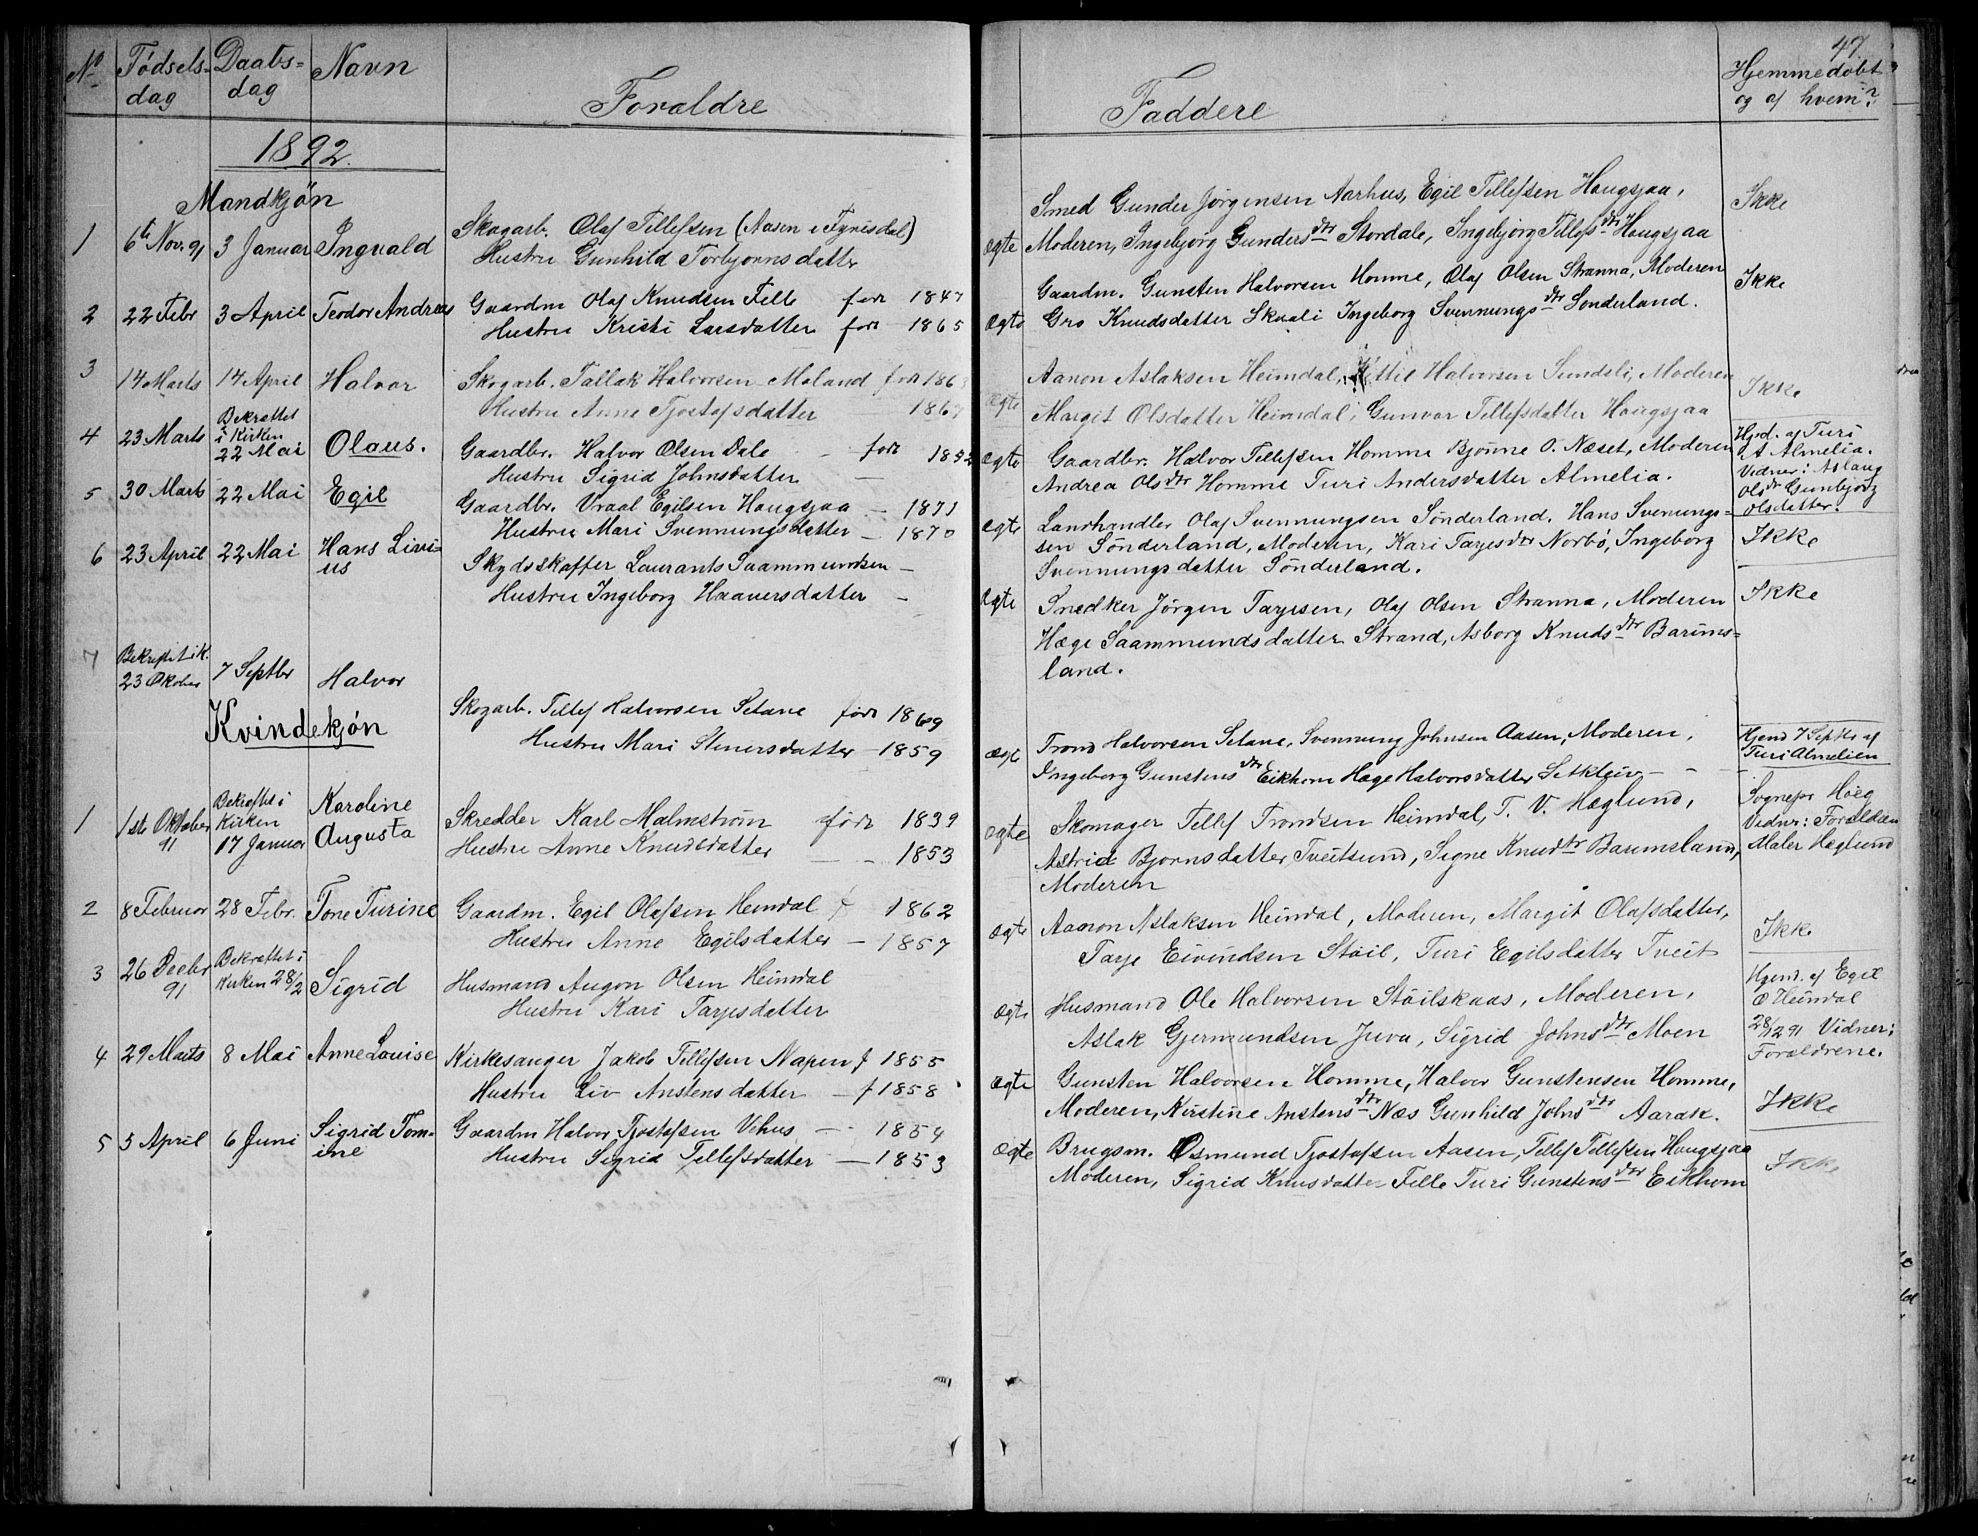 SAKO, Nissedal kirkebøker, G/Gb/L0002: Klokkerbok nr. II 2, 1863-1892, s. 47